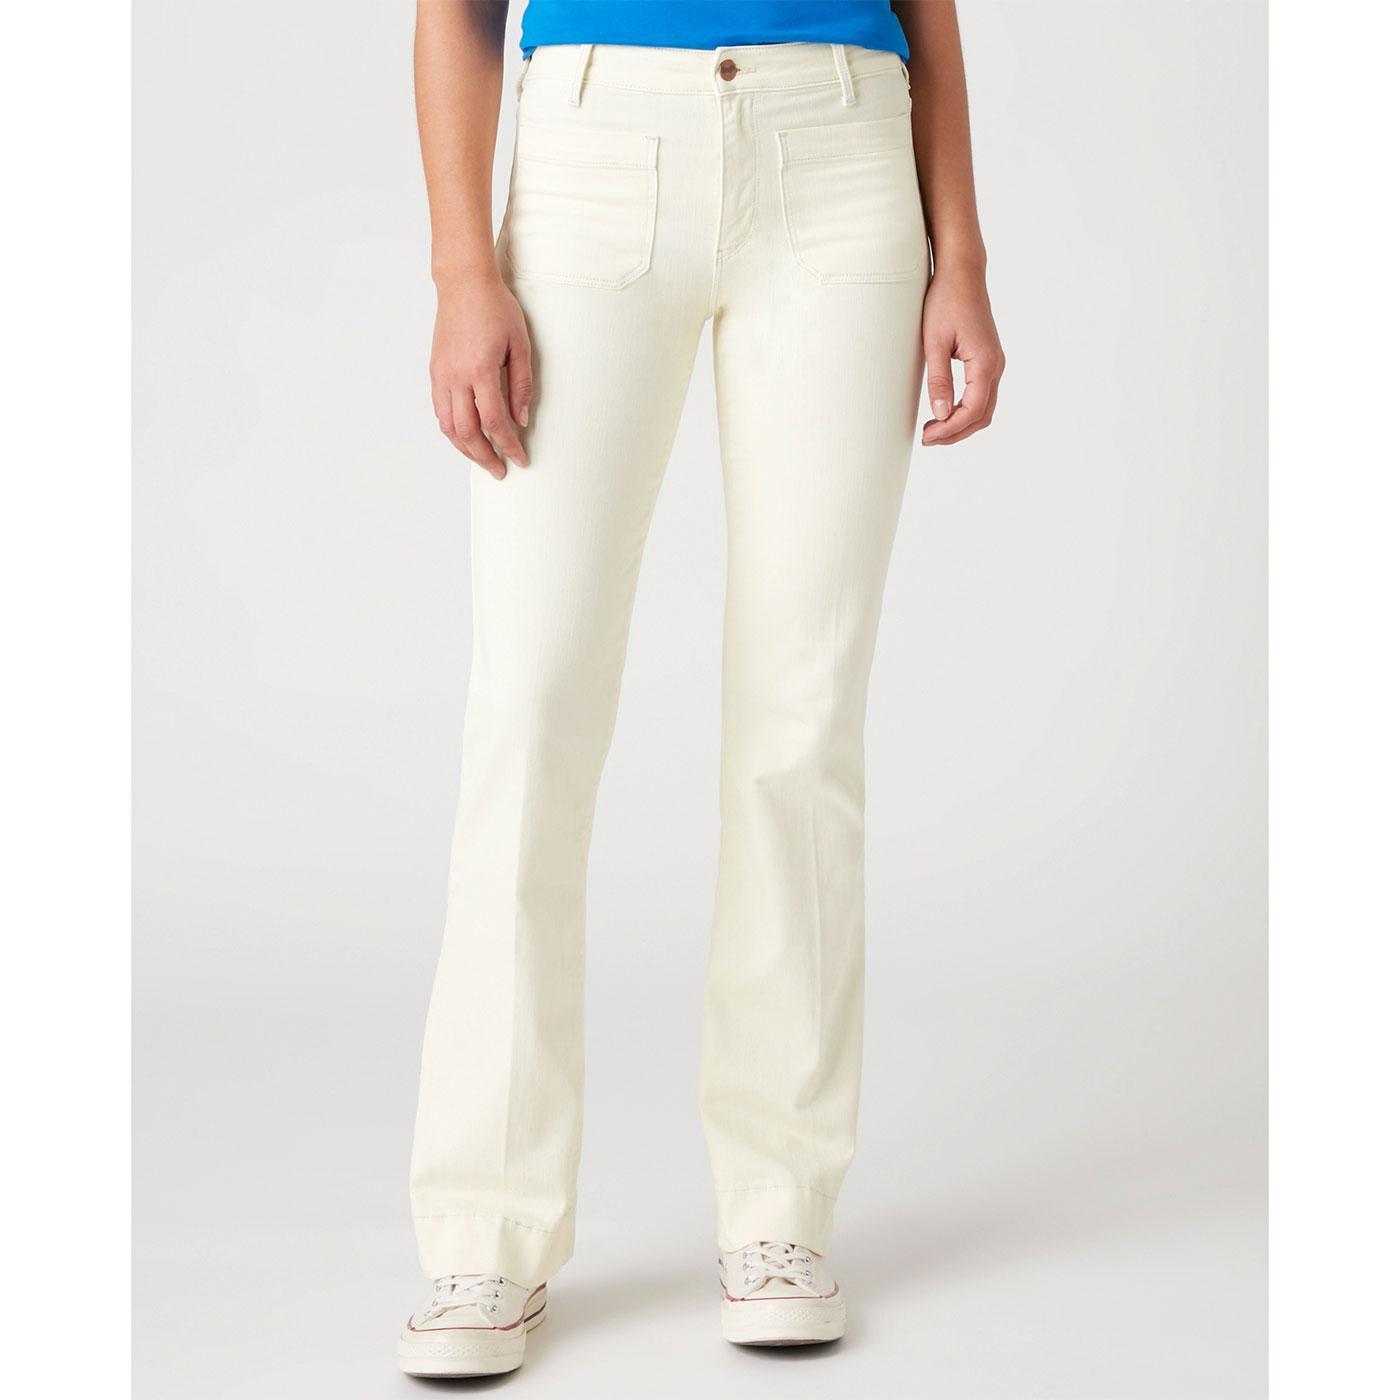 WRANGLER Womens Retro 70's High Waist Flared Jeans